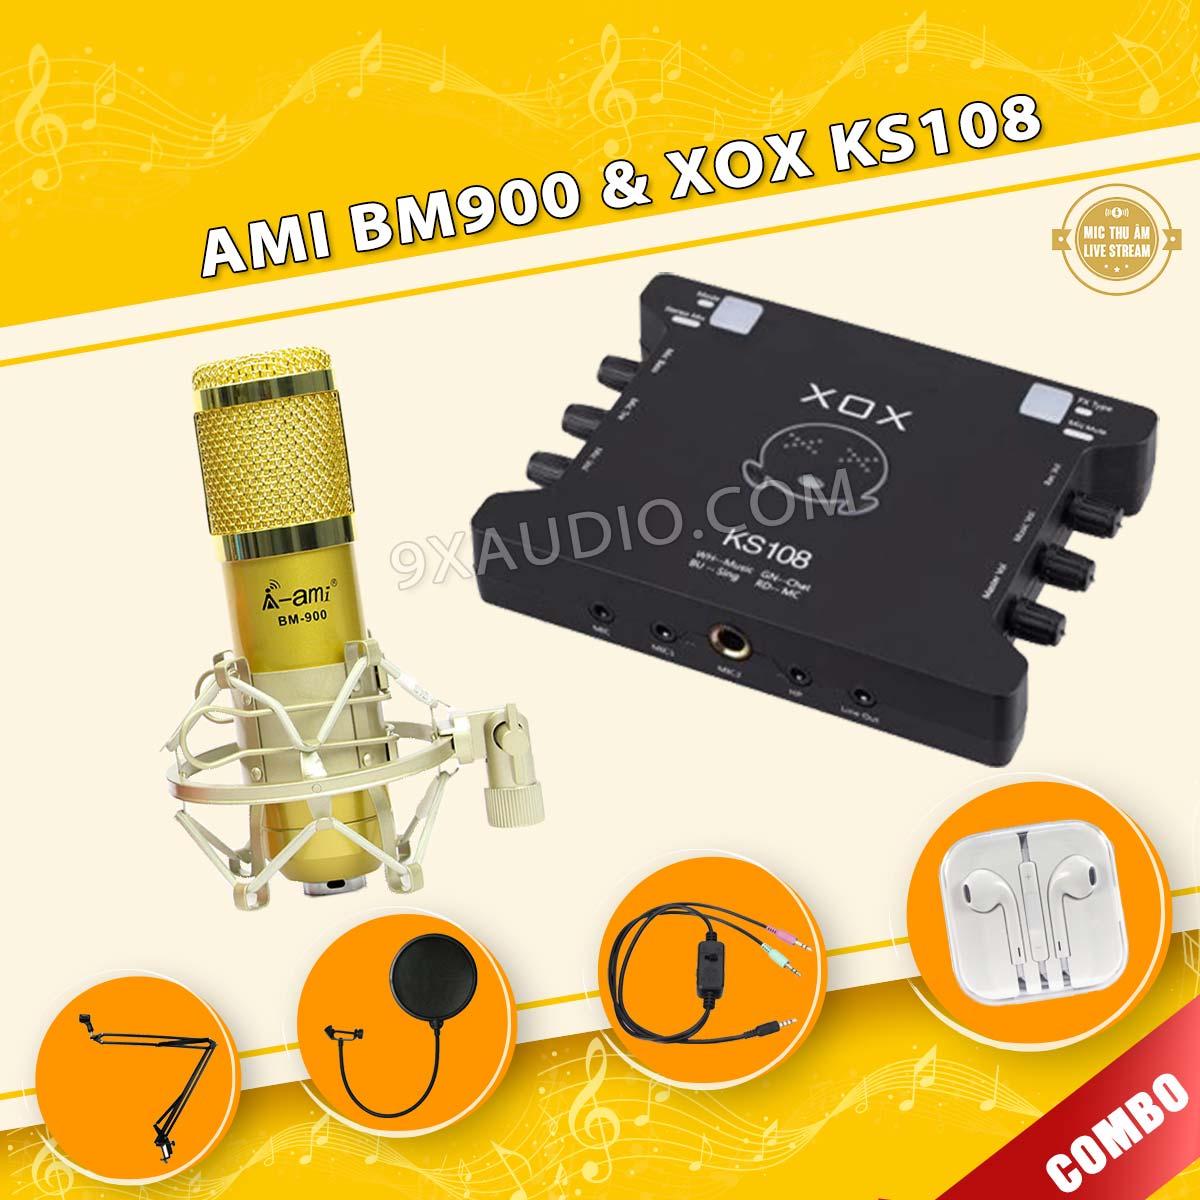 mic thu âm ami bm900 xox ks108 12